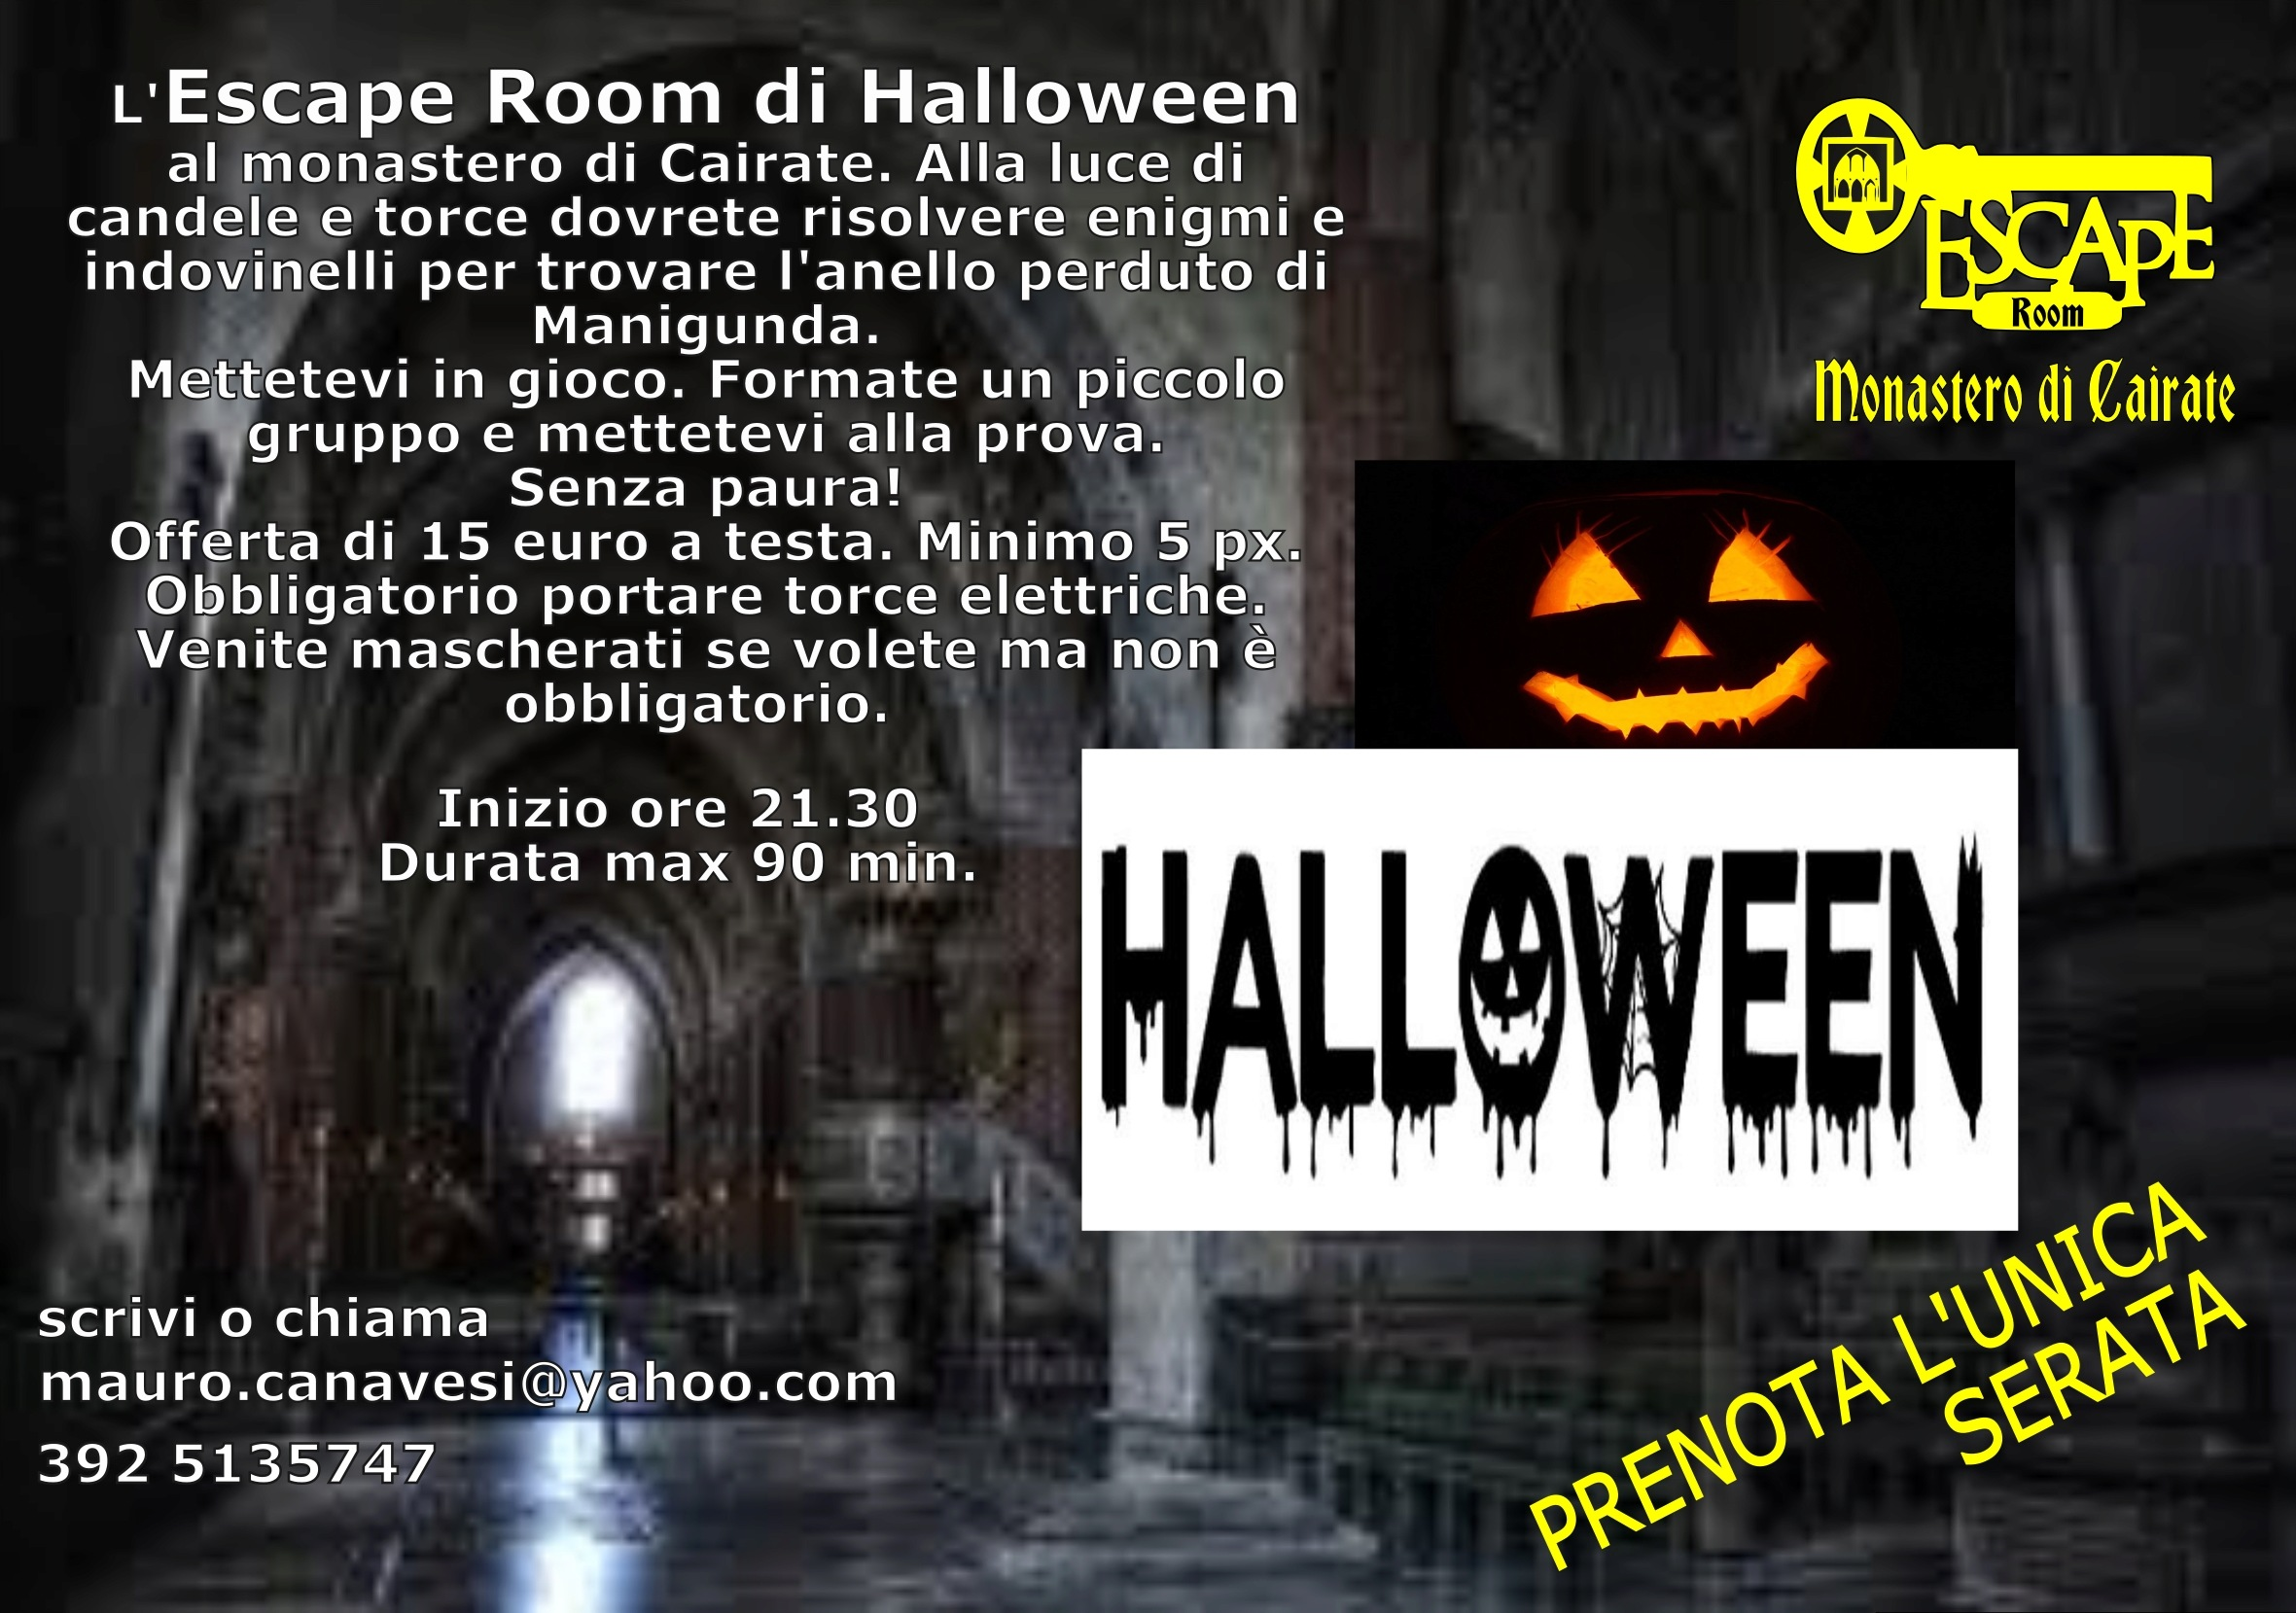 Halloween - ESCAPE ROOM Escape10